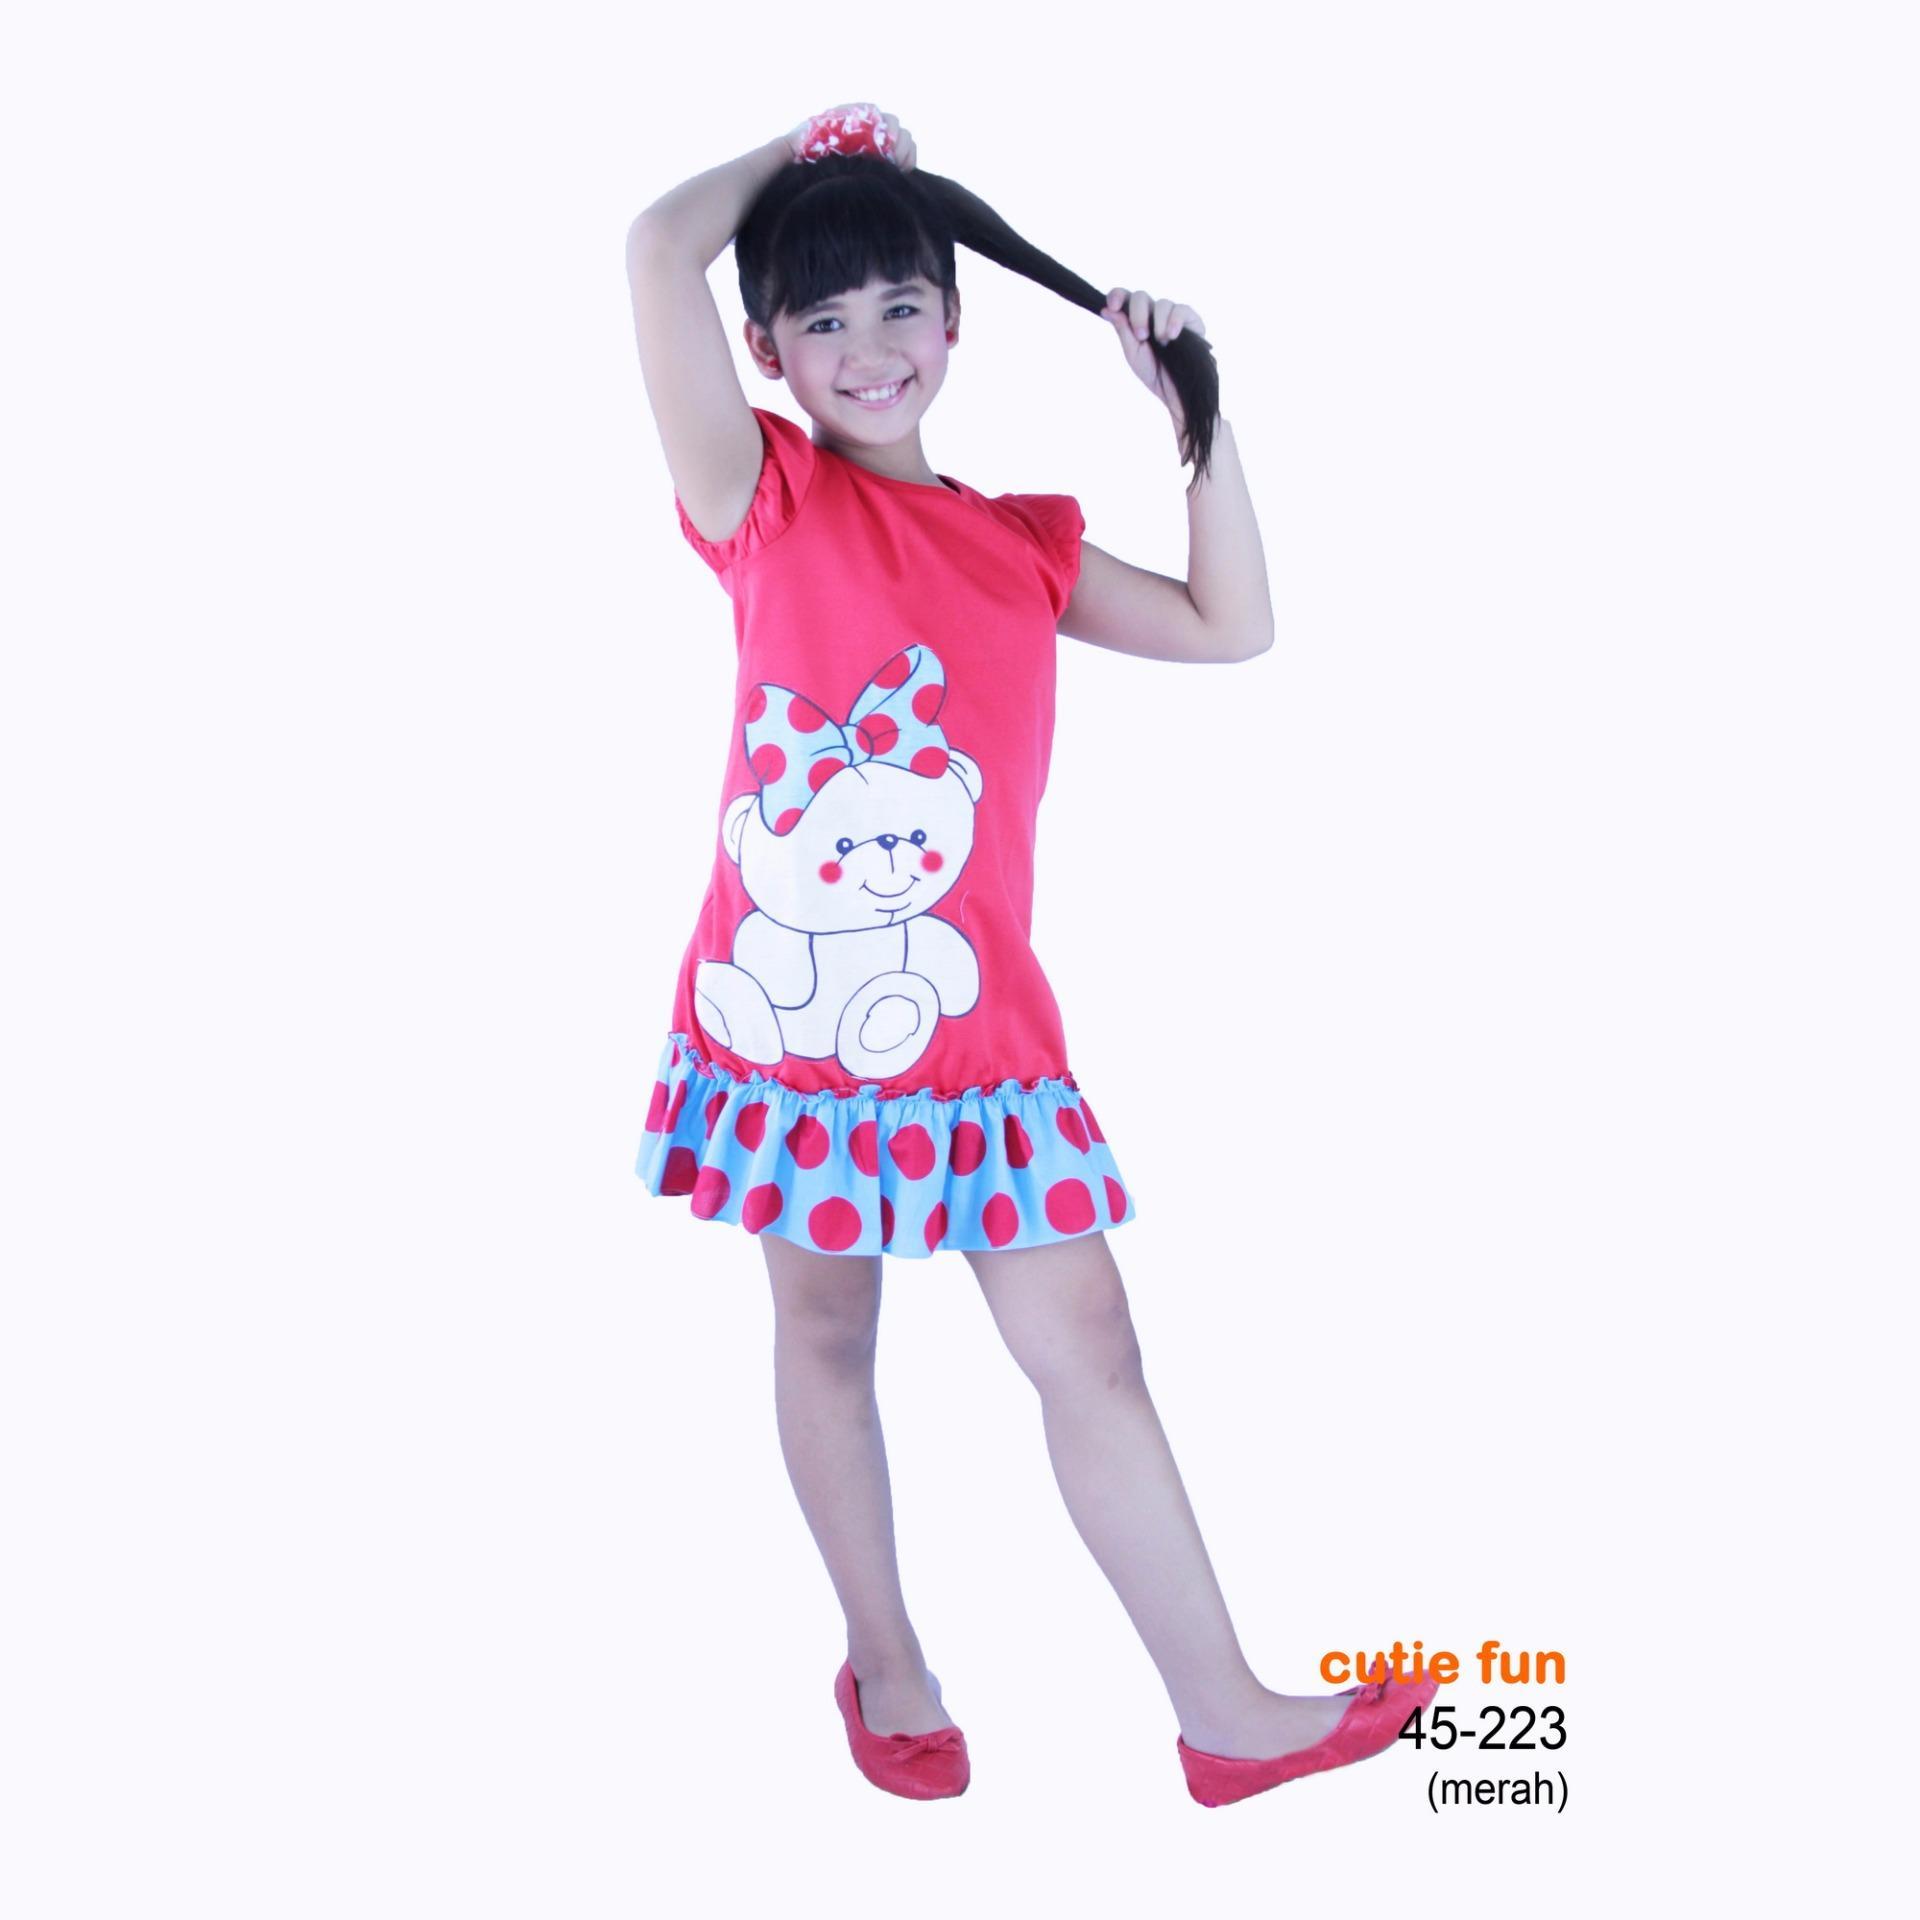 Spesifikasi Cutie Fun 45 223 Pakaian Baju Dress Anak Perempuan Usia 2 11 Tahun Paling Bagus